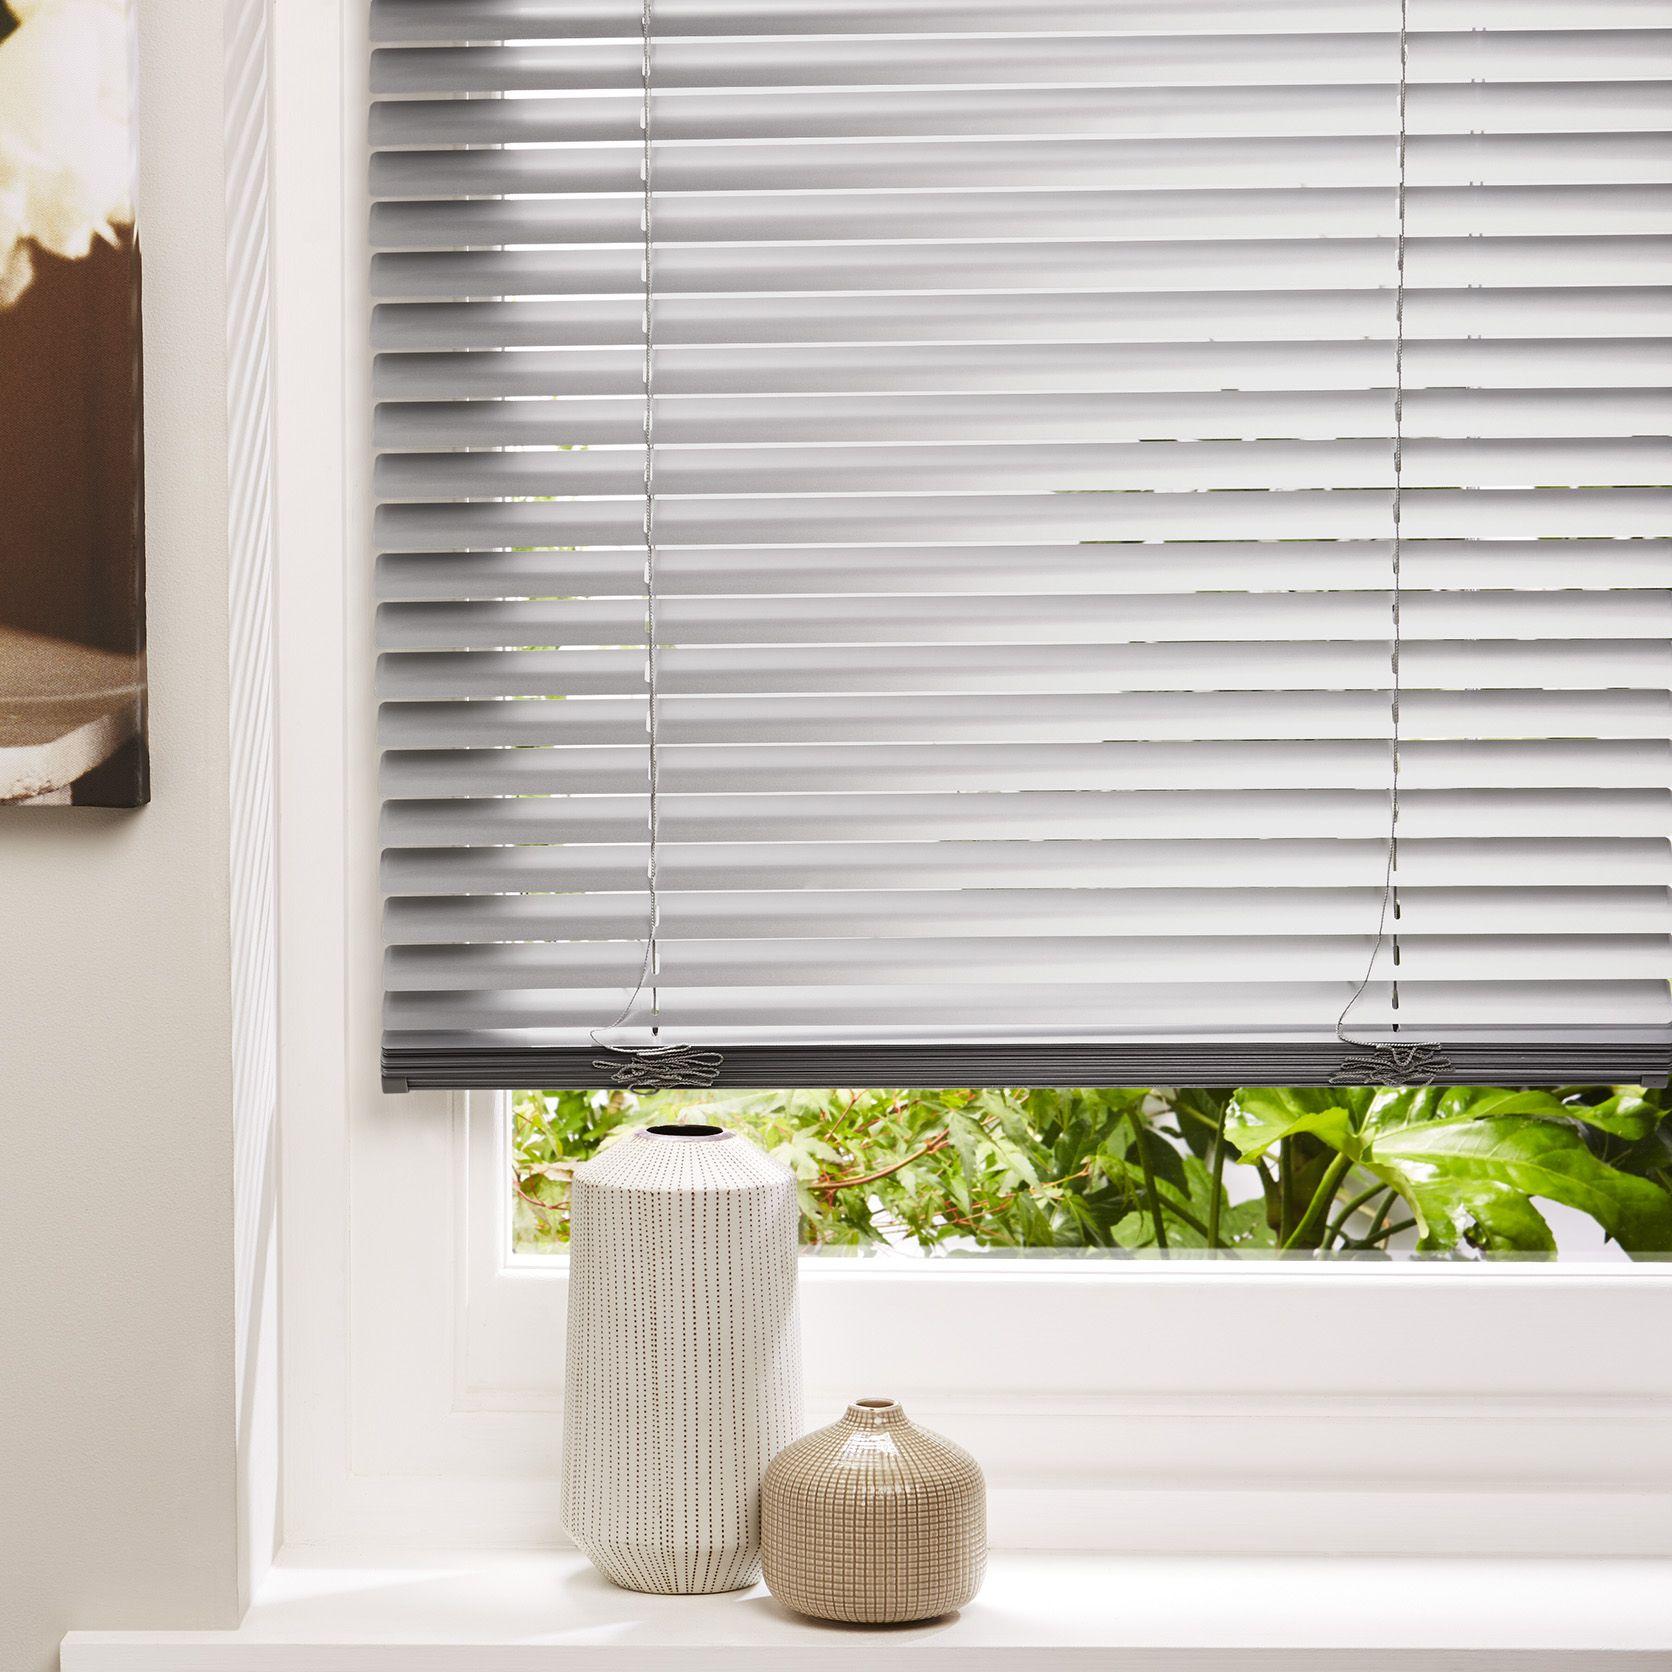 Bathroom Window Blinds B&Q curtains, blinds & shutters | curtain poles & roller blinds | diy